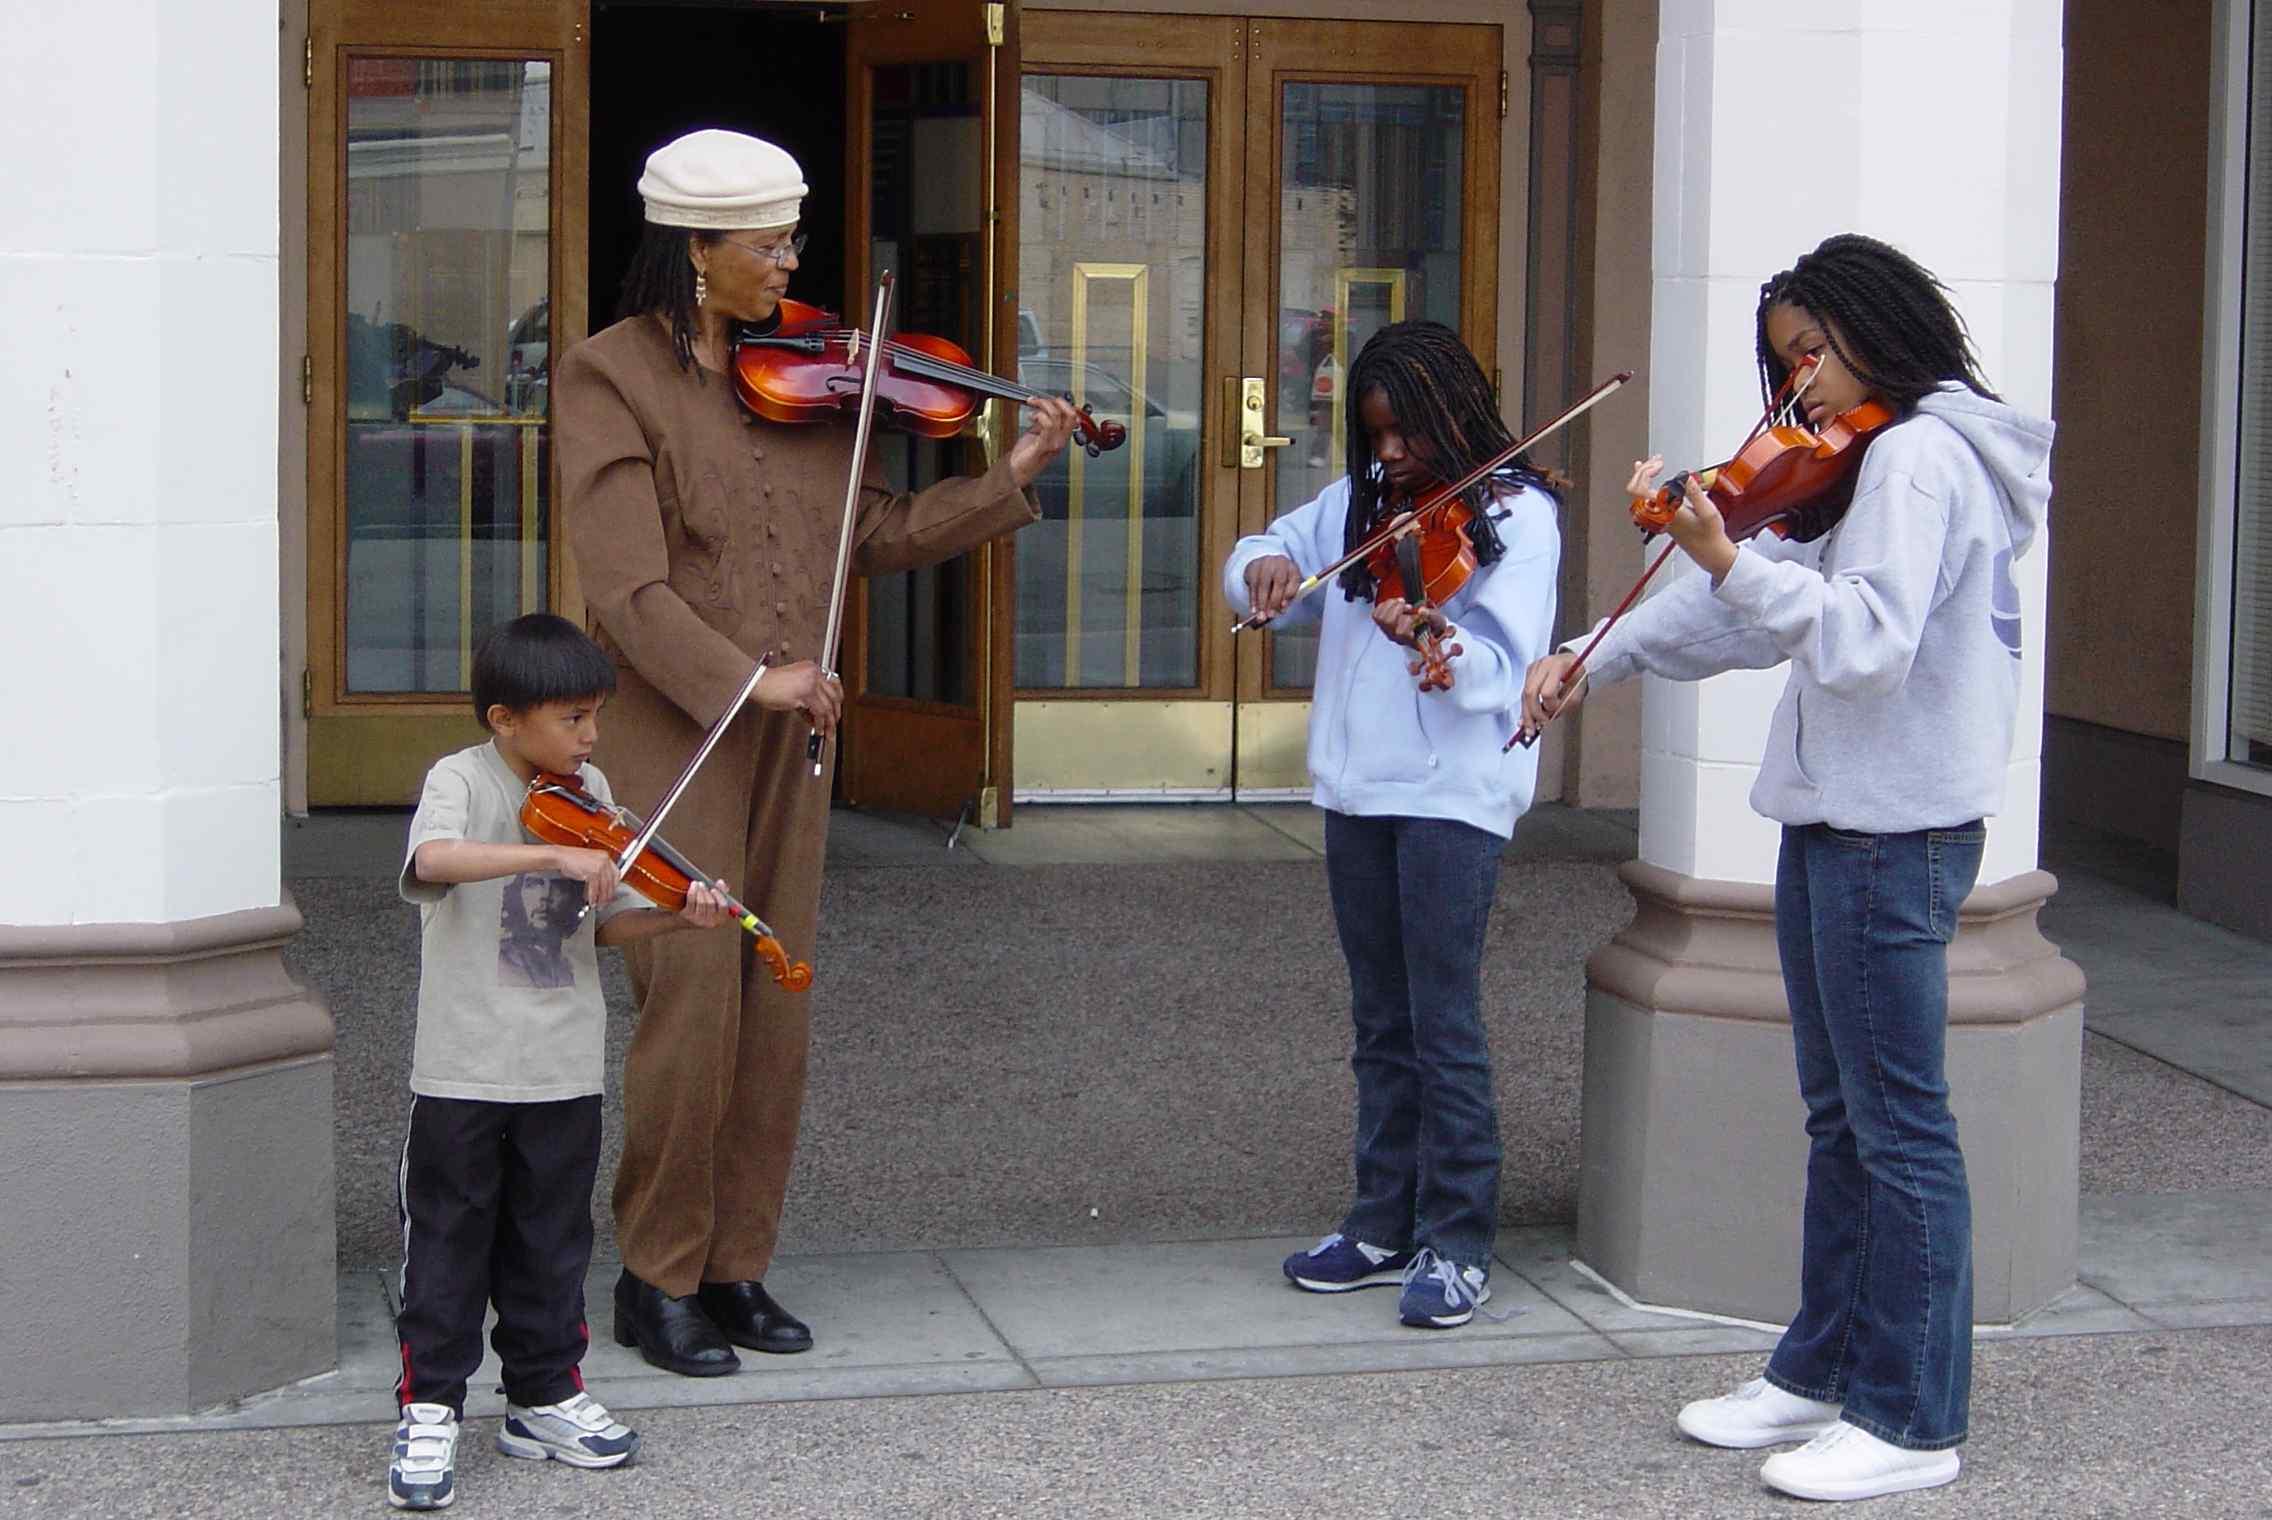 Tarika Lewis and Students Serenading Outside the Malonga Center